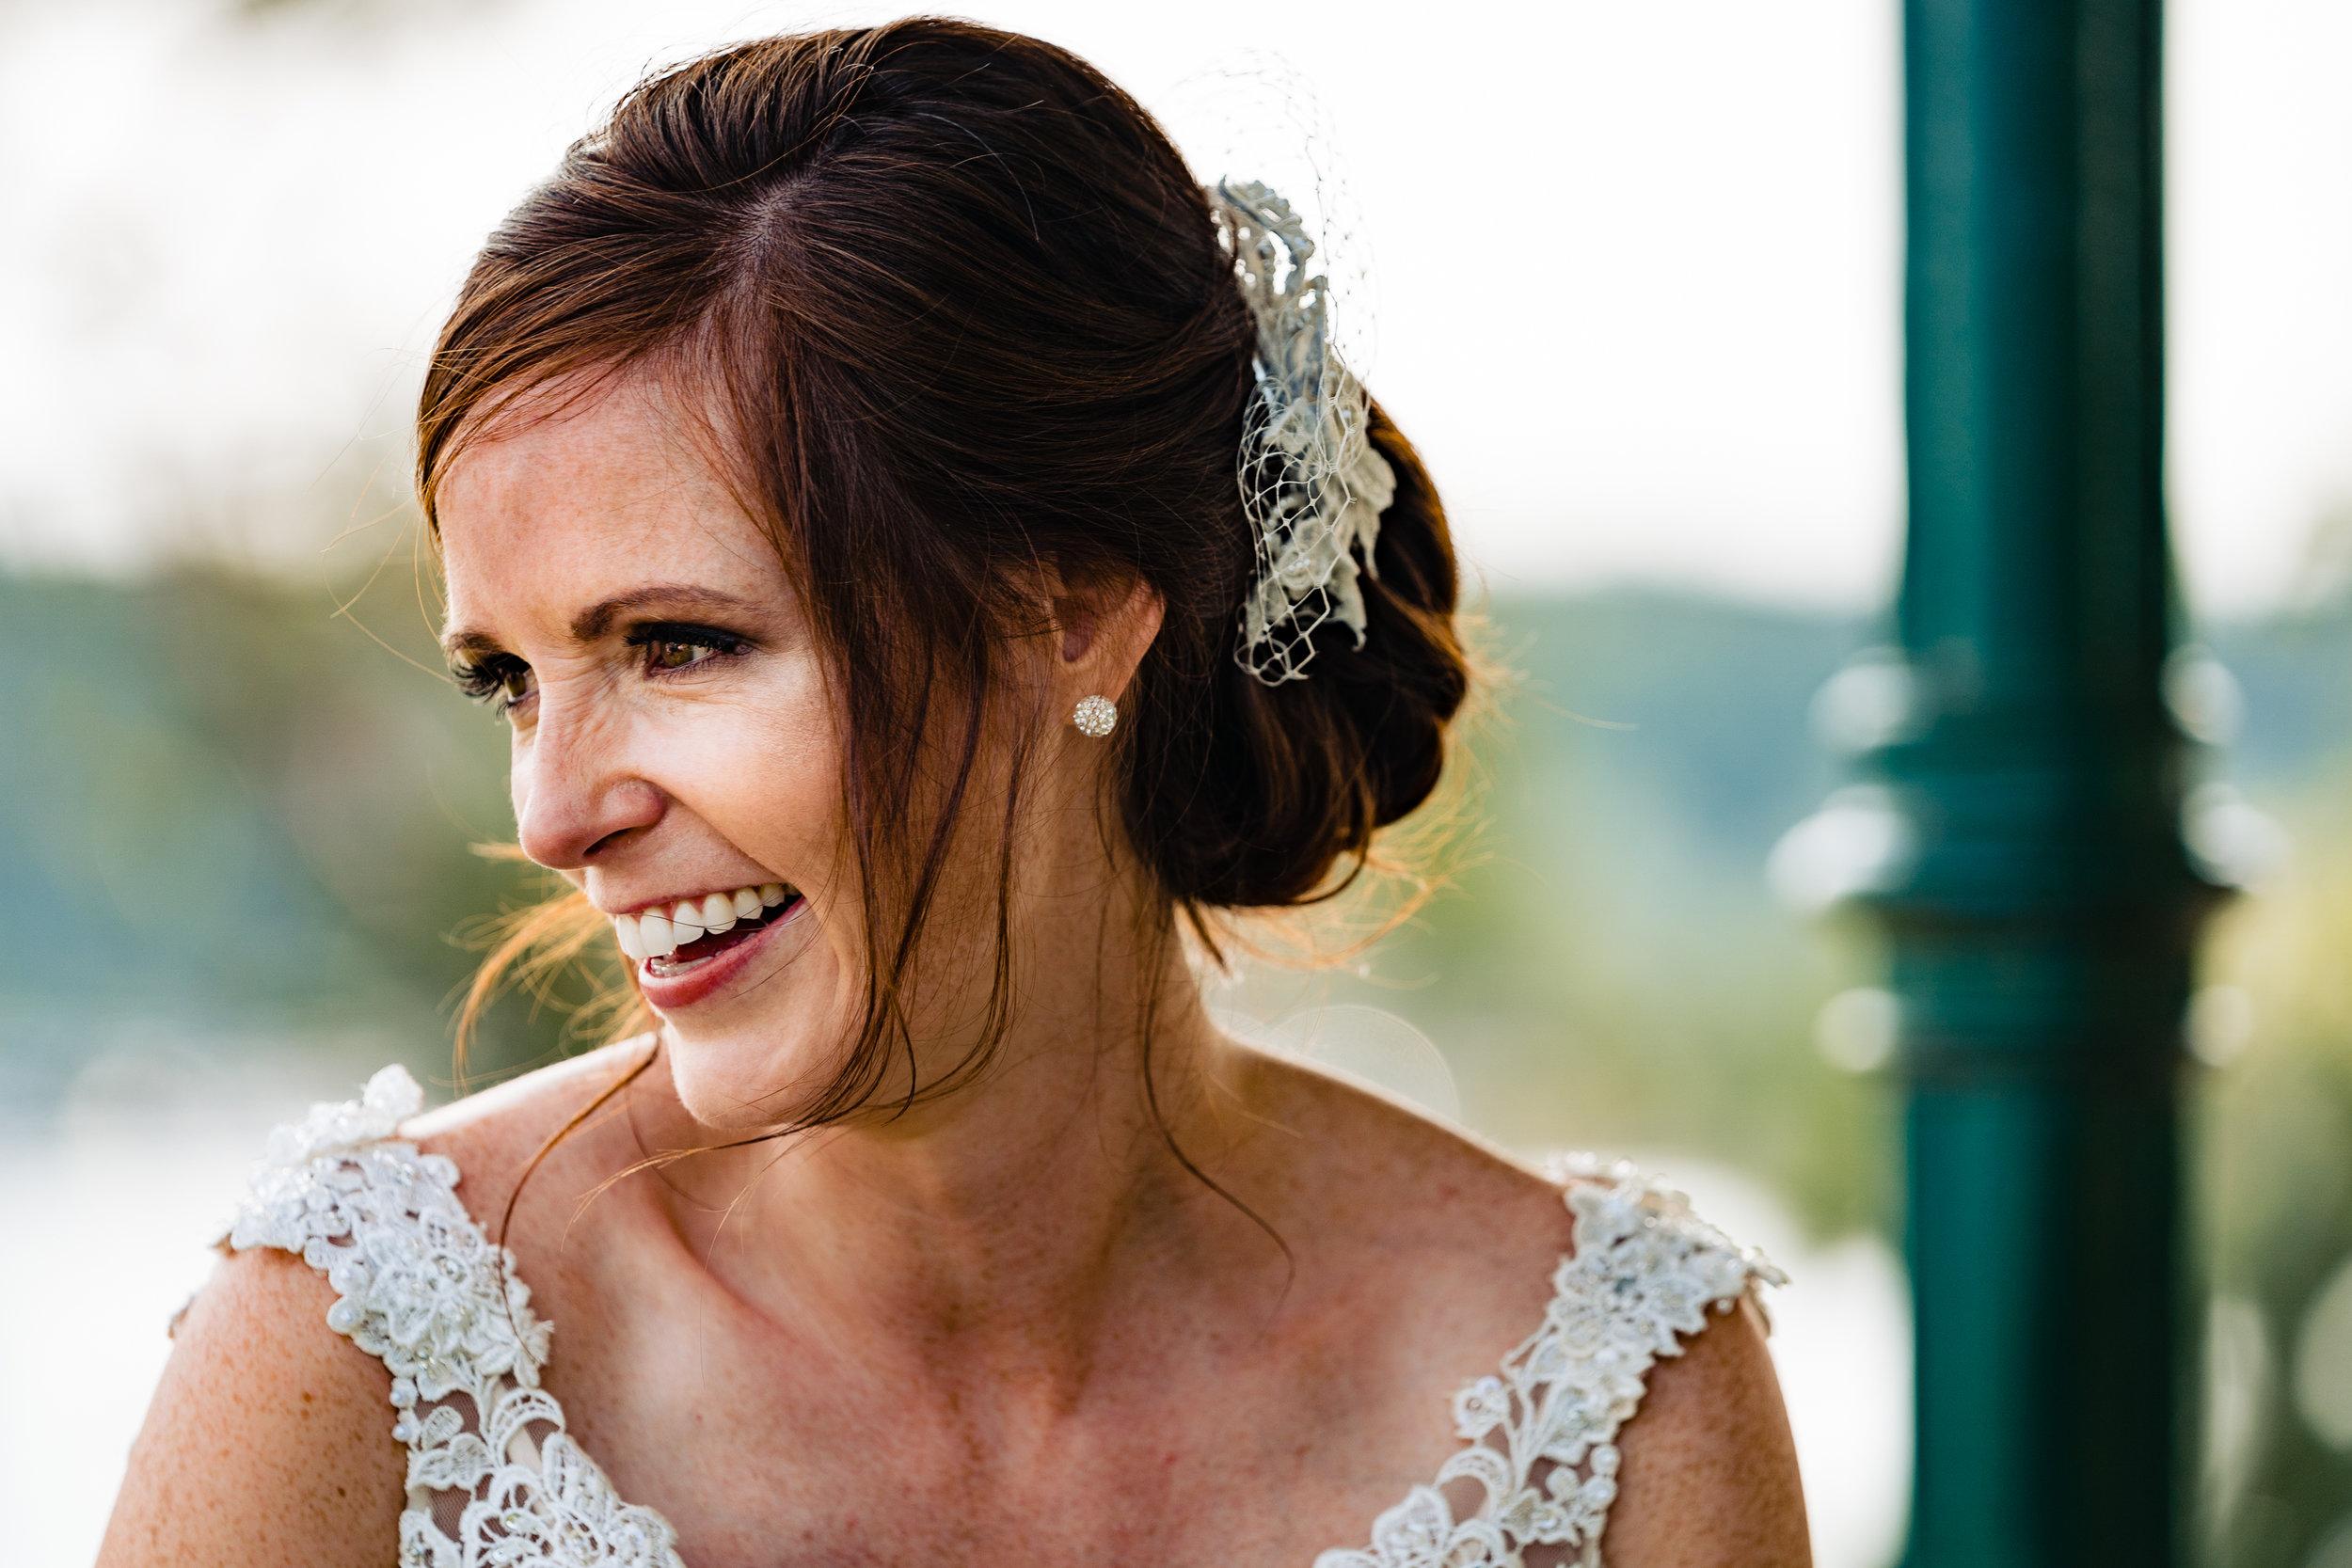 Jenna-Pat-255halifax-novascotia-weddingphotography-wedding-foxandfellow.jpg